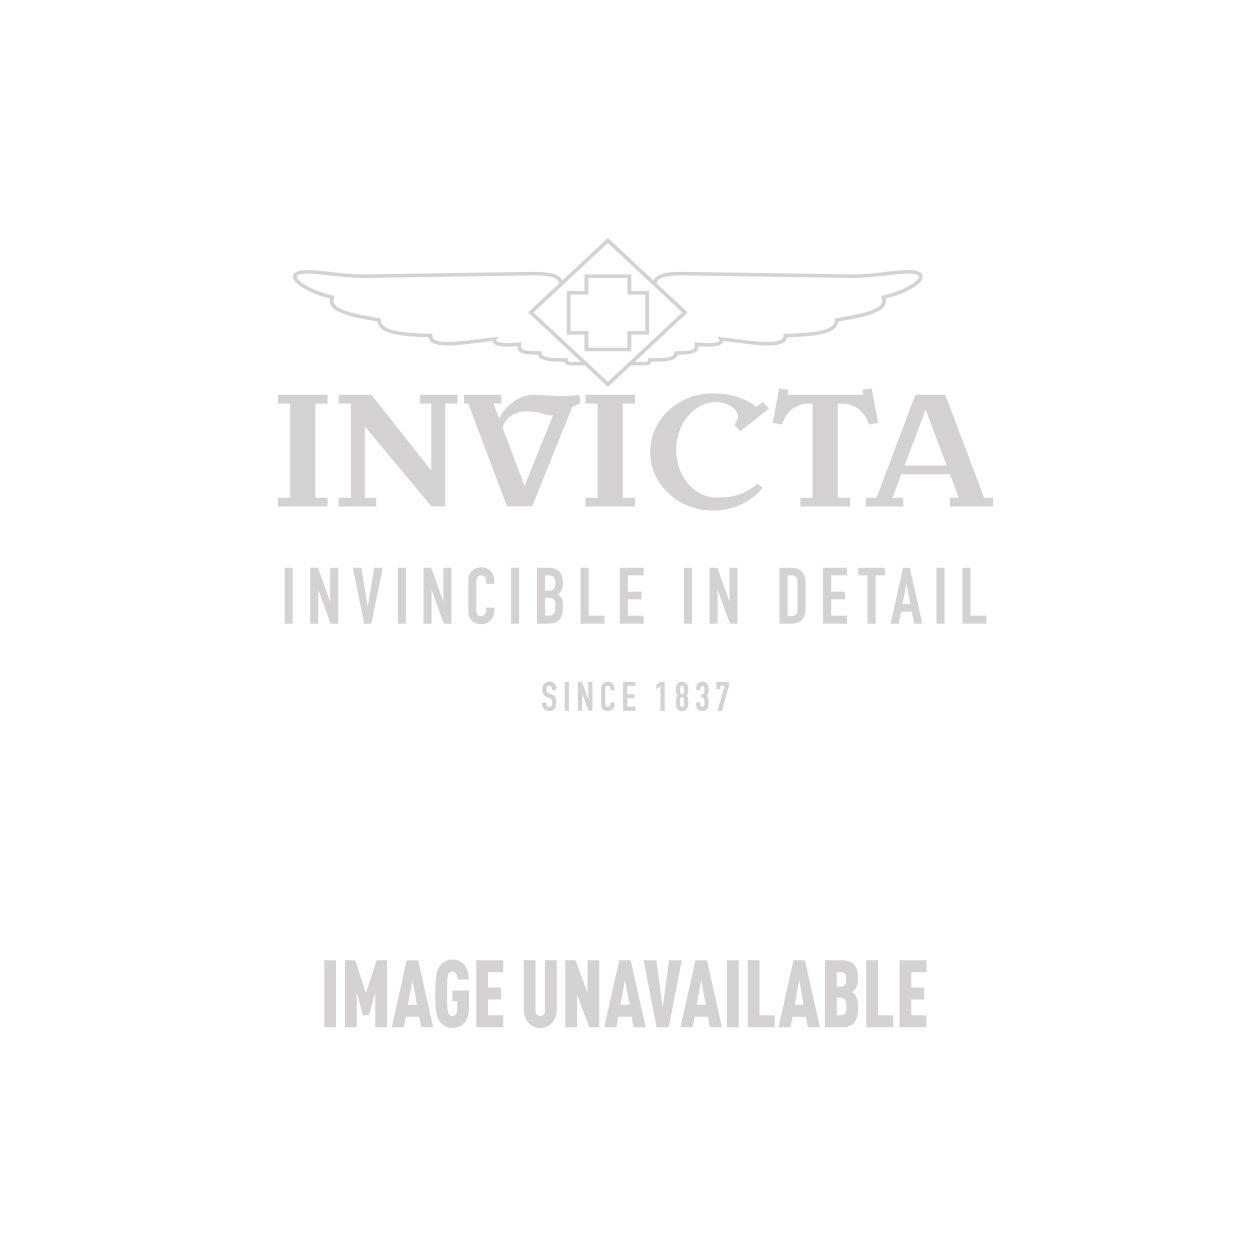 INVICTA Jewelry DORINN Bracelets 21 7 Silver 925 Rhodium+Red - Model J0132